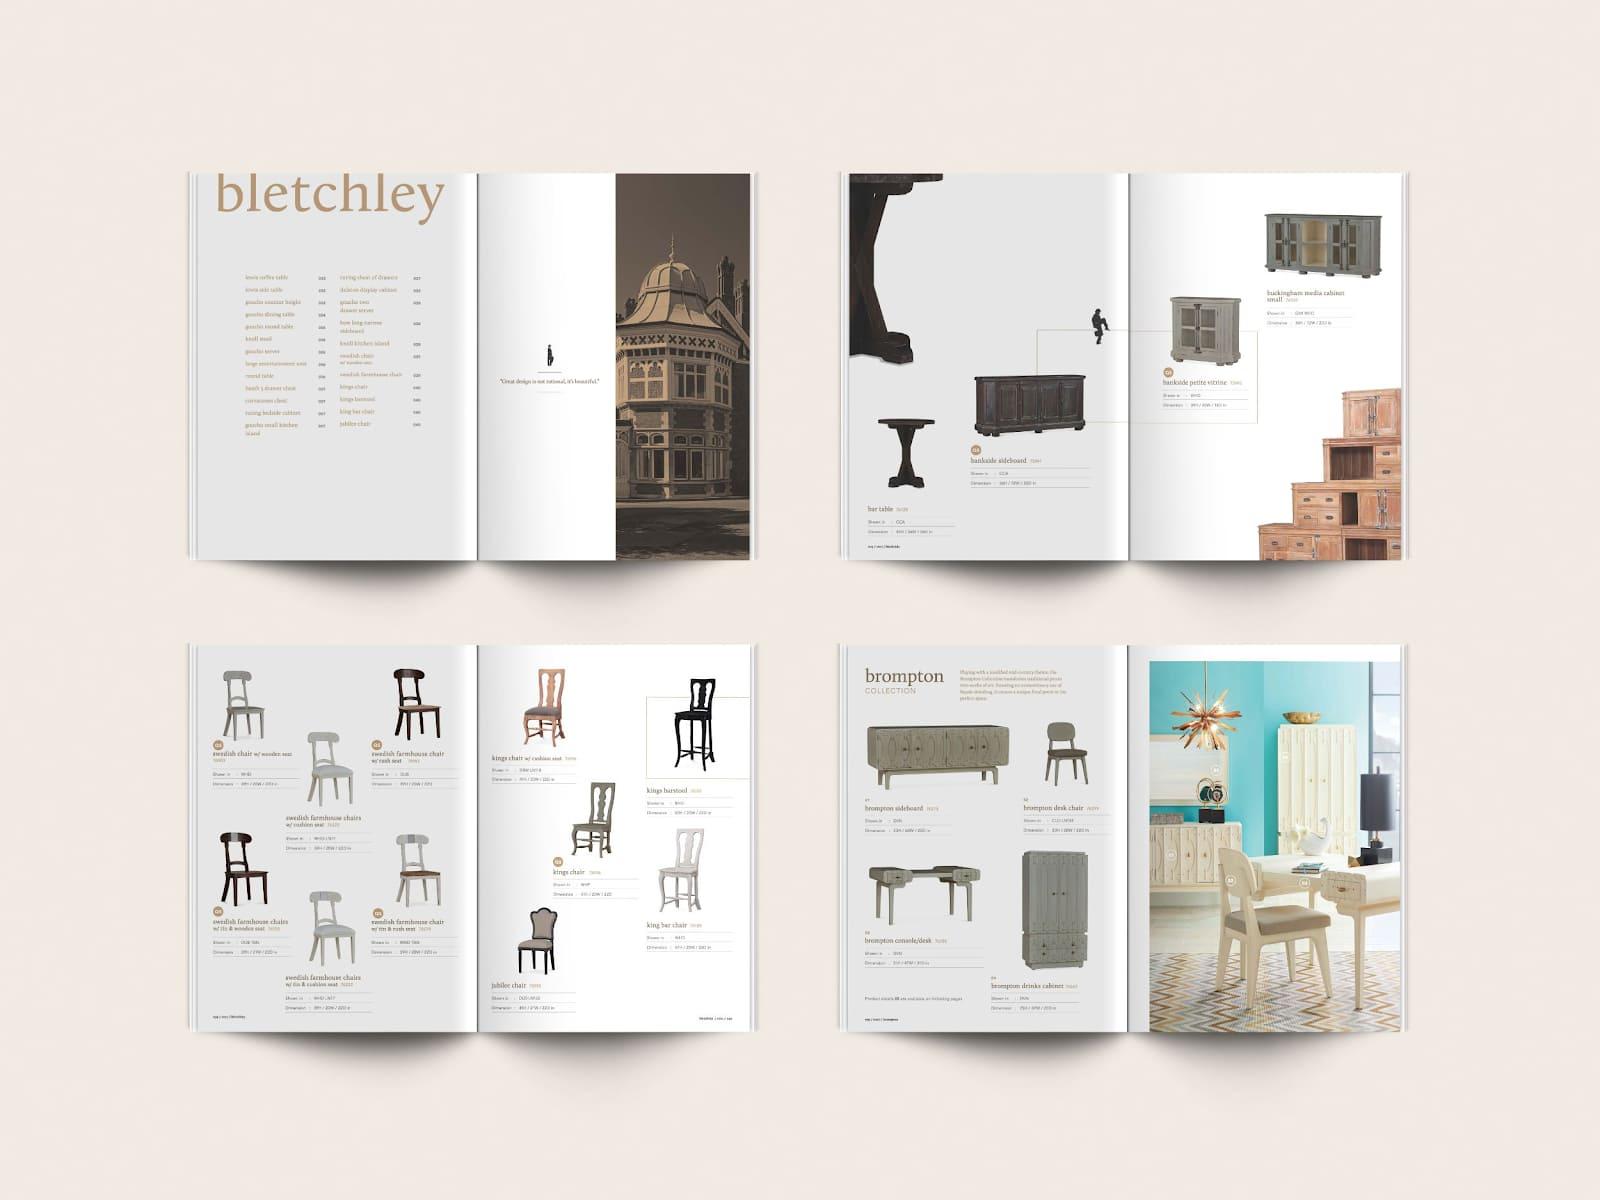 thiết kế catalogue cho doanh nghiệp